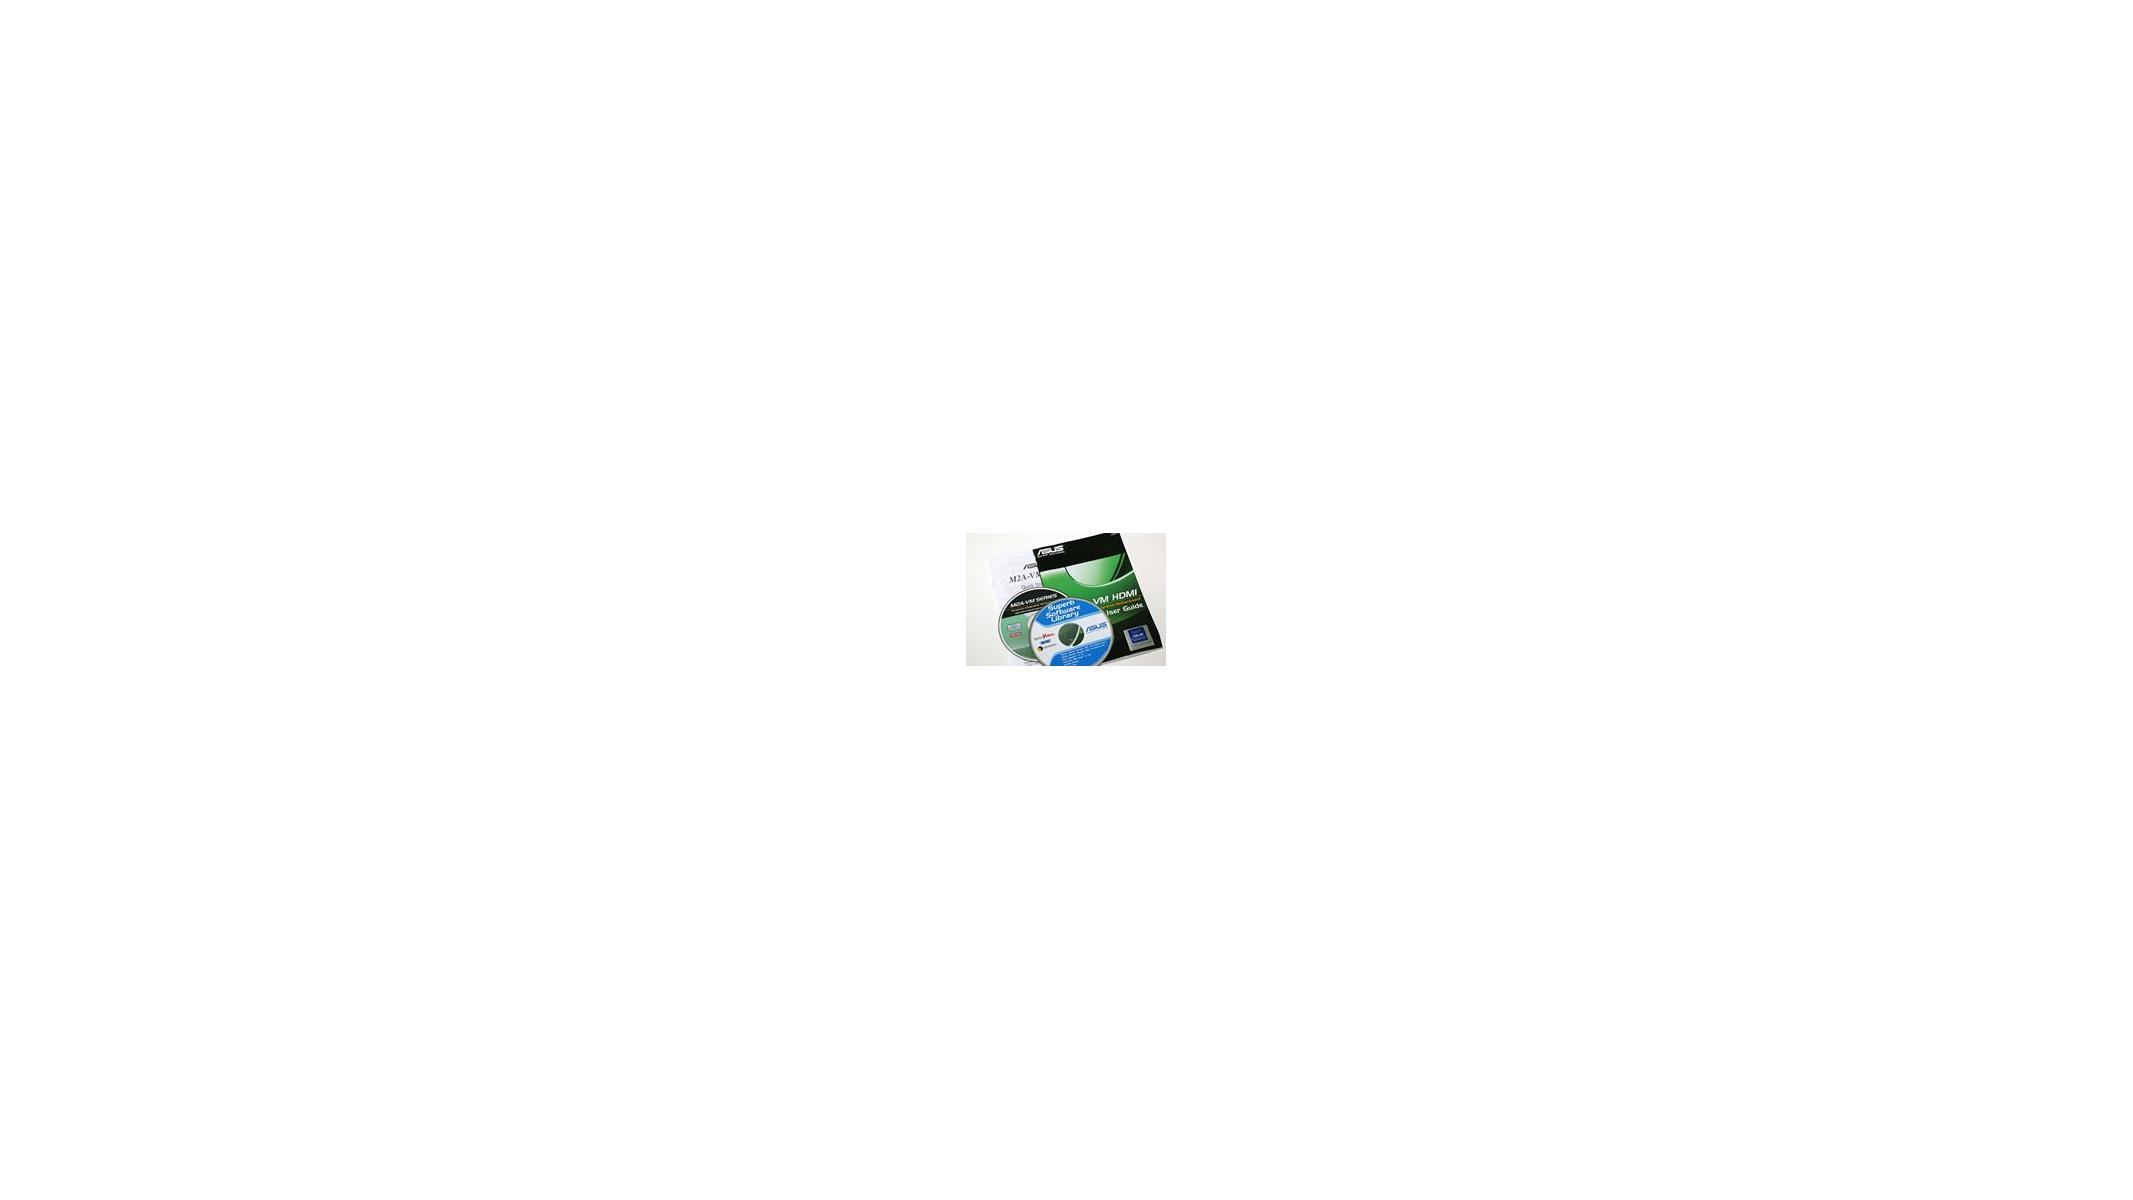 Asus M2A-VM HDMI Phoenix 64 BIT